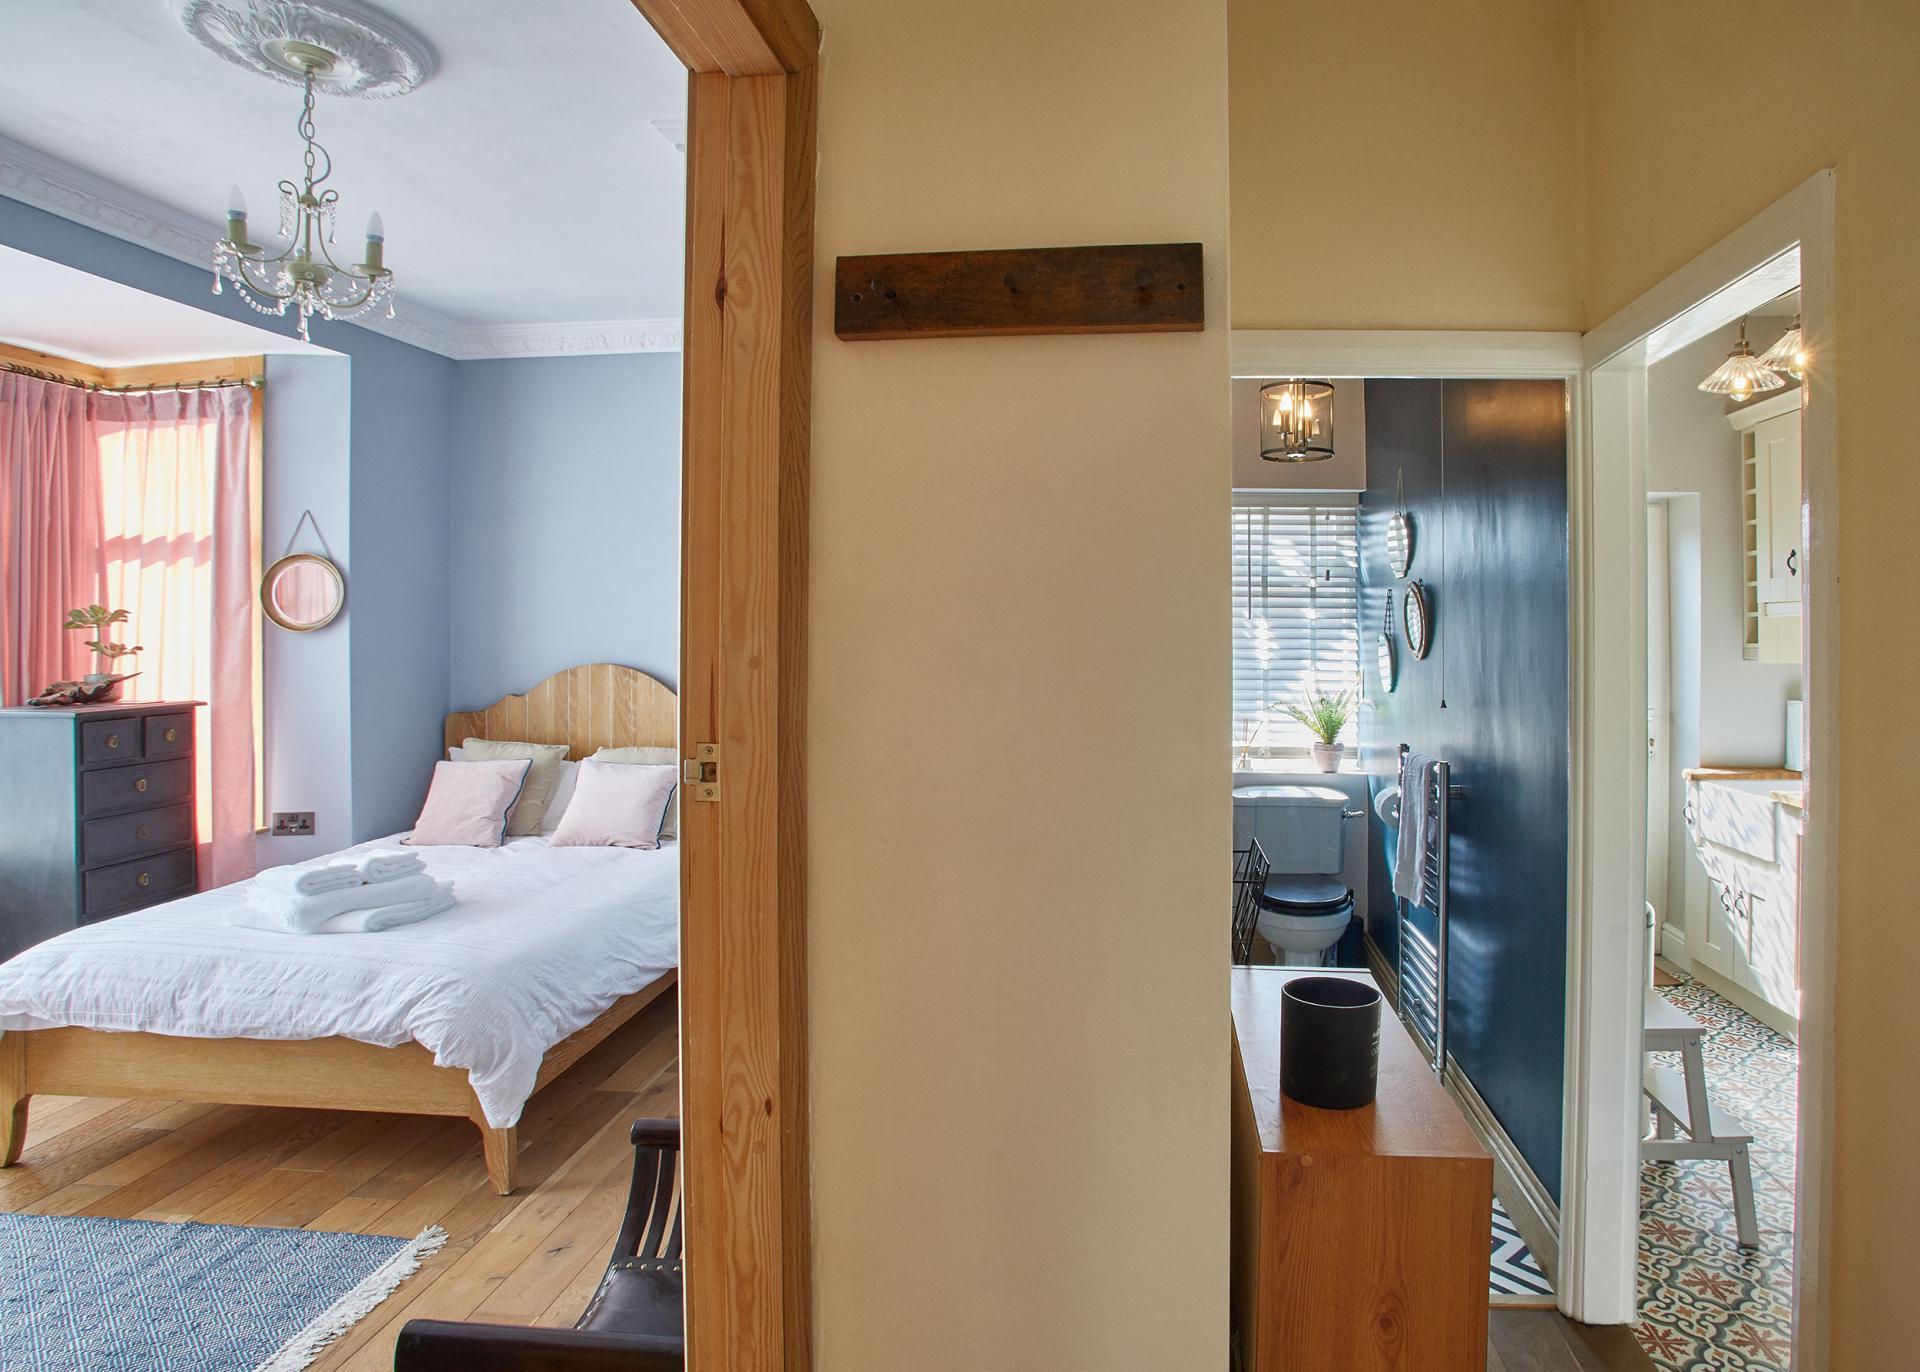 Corporate Serviced Apartments In Harrogate - SilverDoor